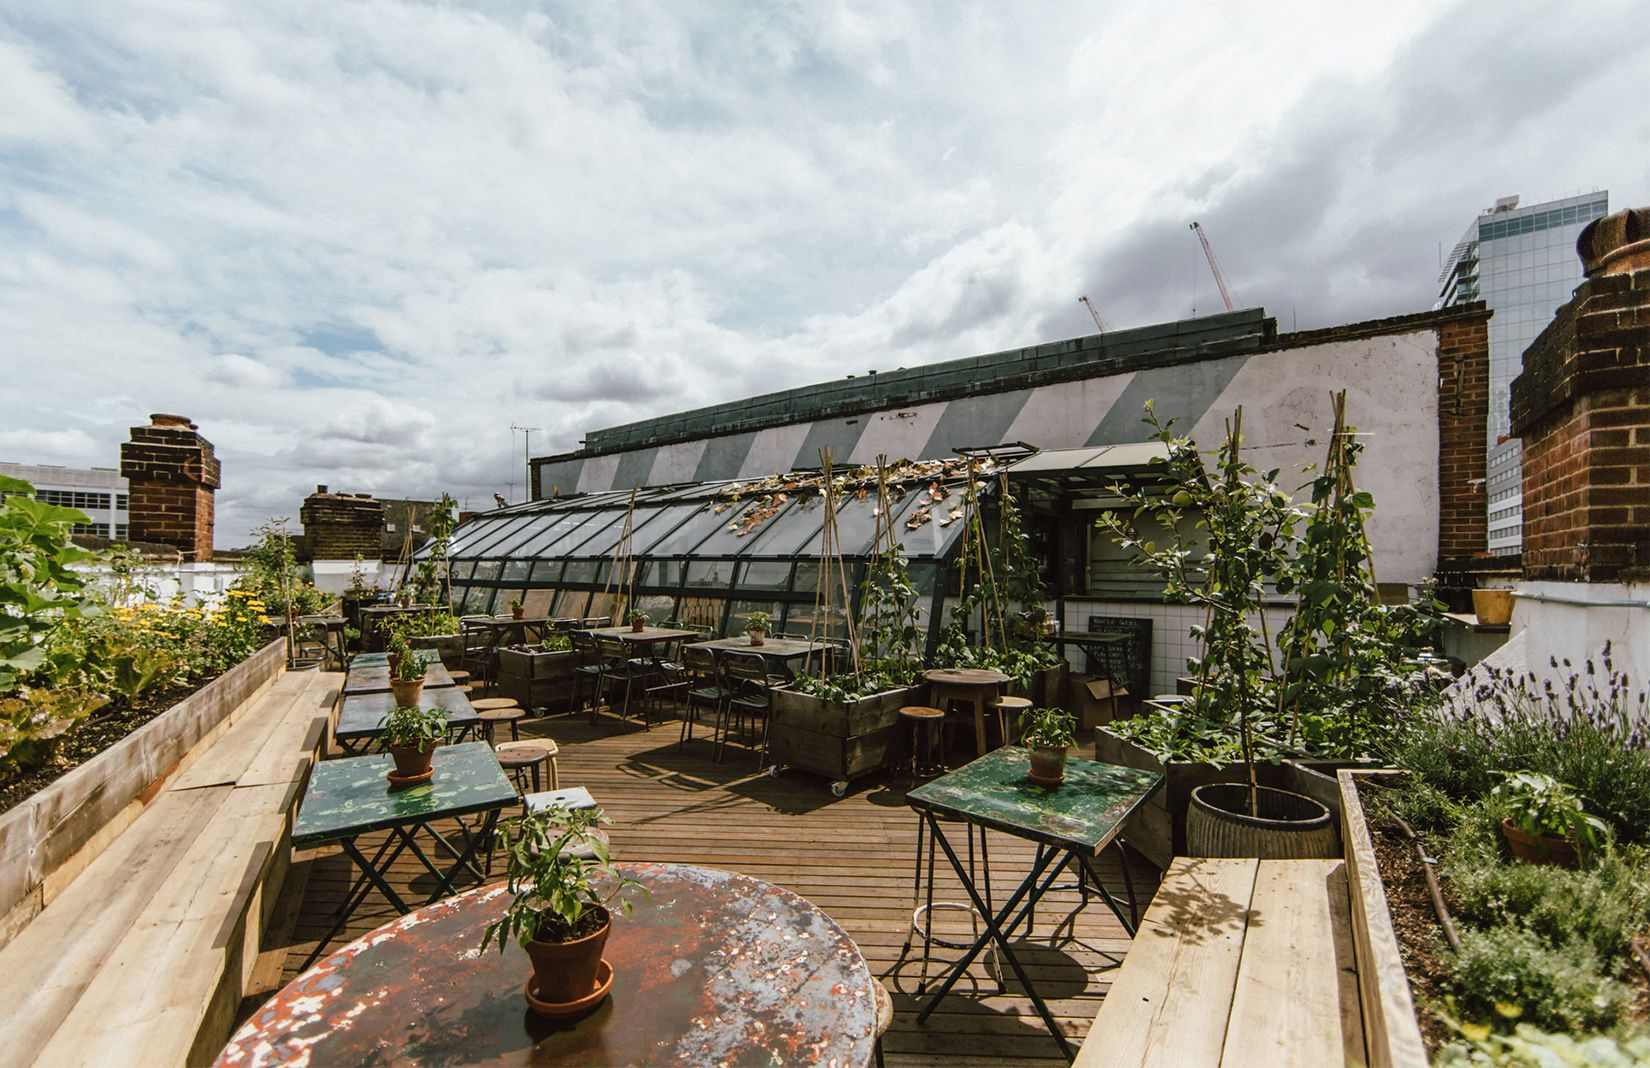 77 Inspirant Rooftop Garden Bar Londres Pour Petit Espace London Bars Outdoor Restaurant Best Rooftop Bars